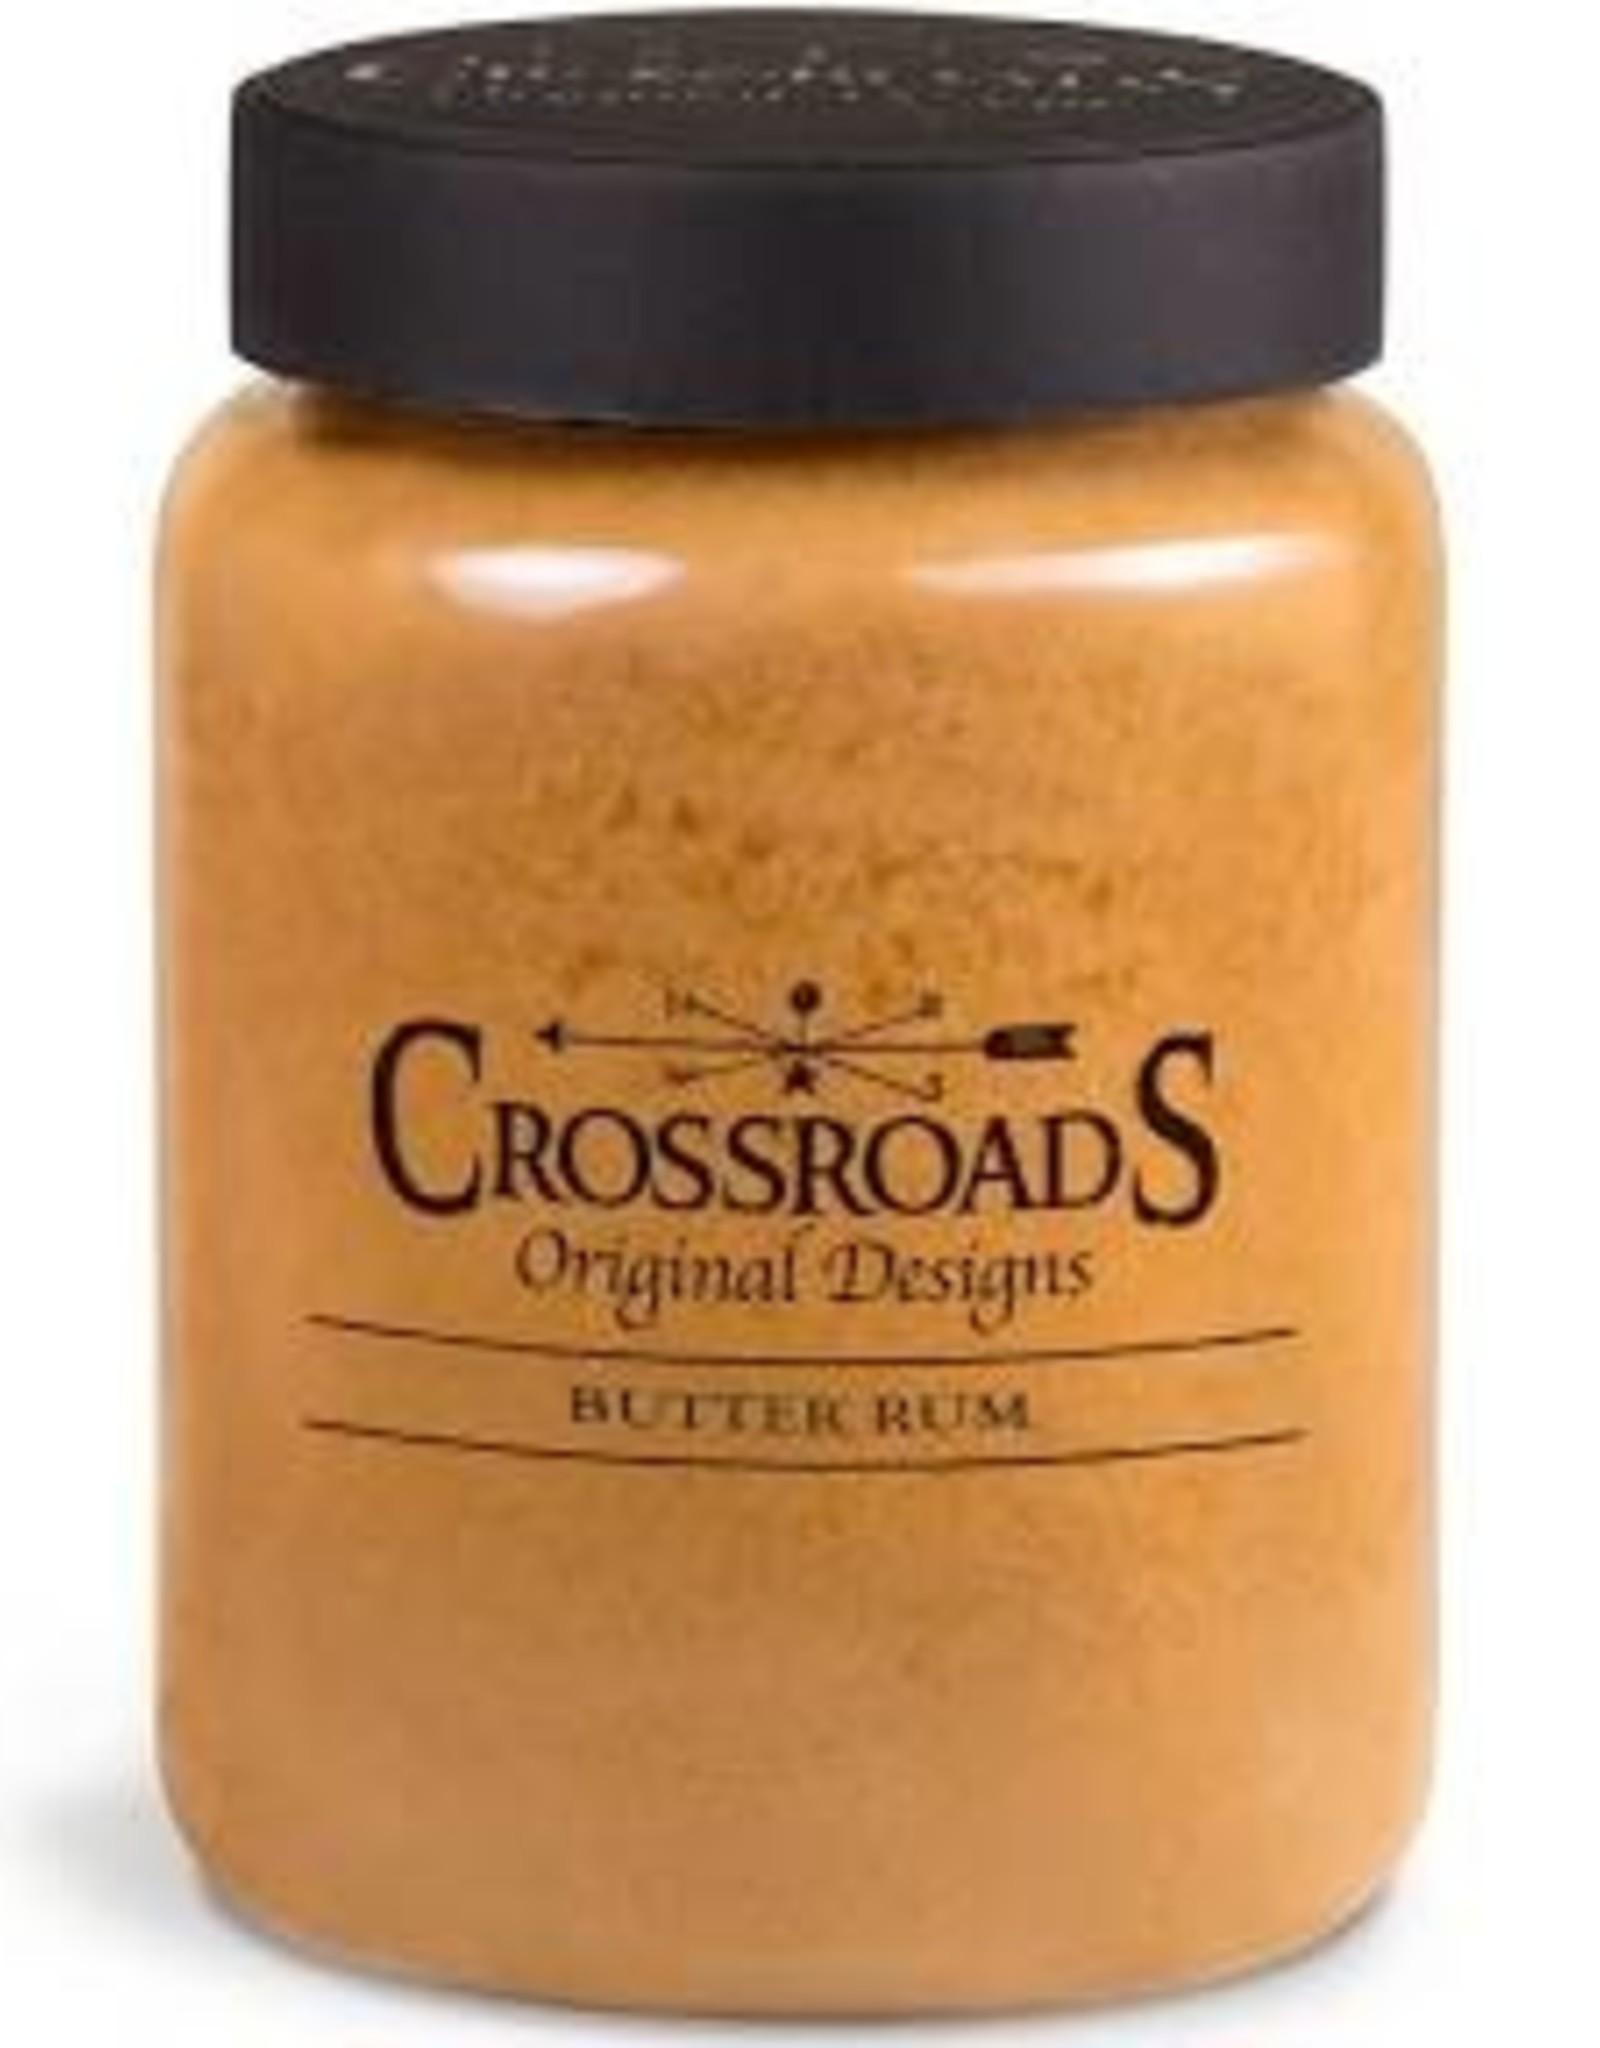 Crossroads Butter Rum Candle